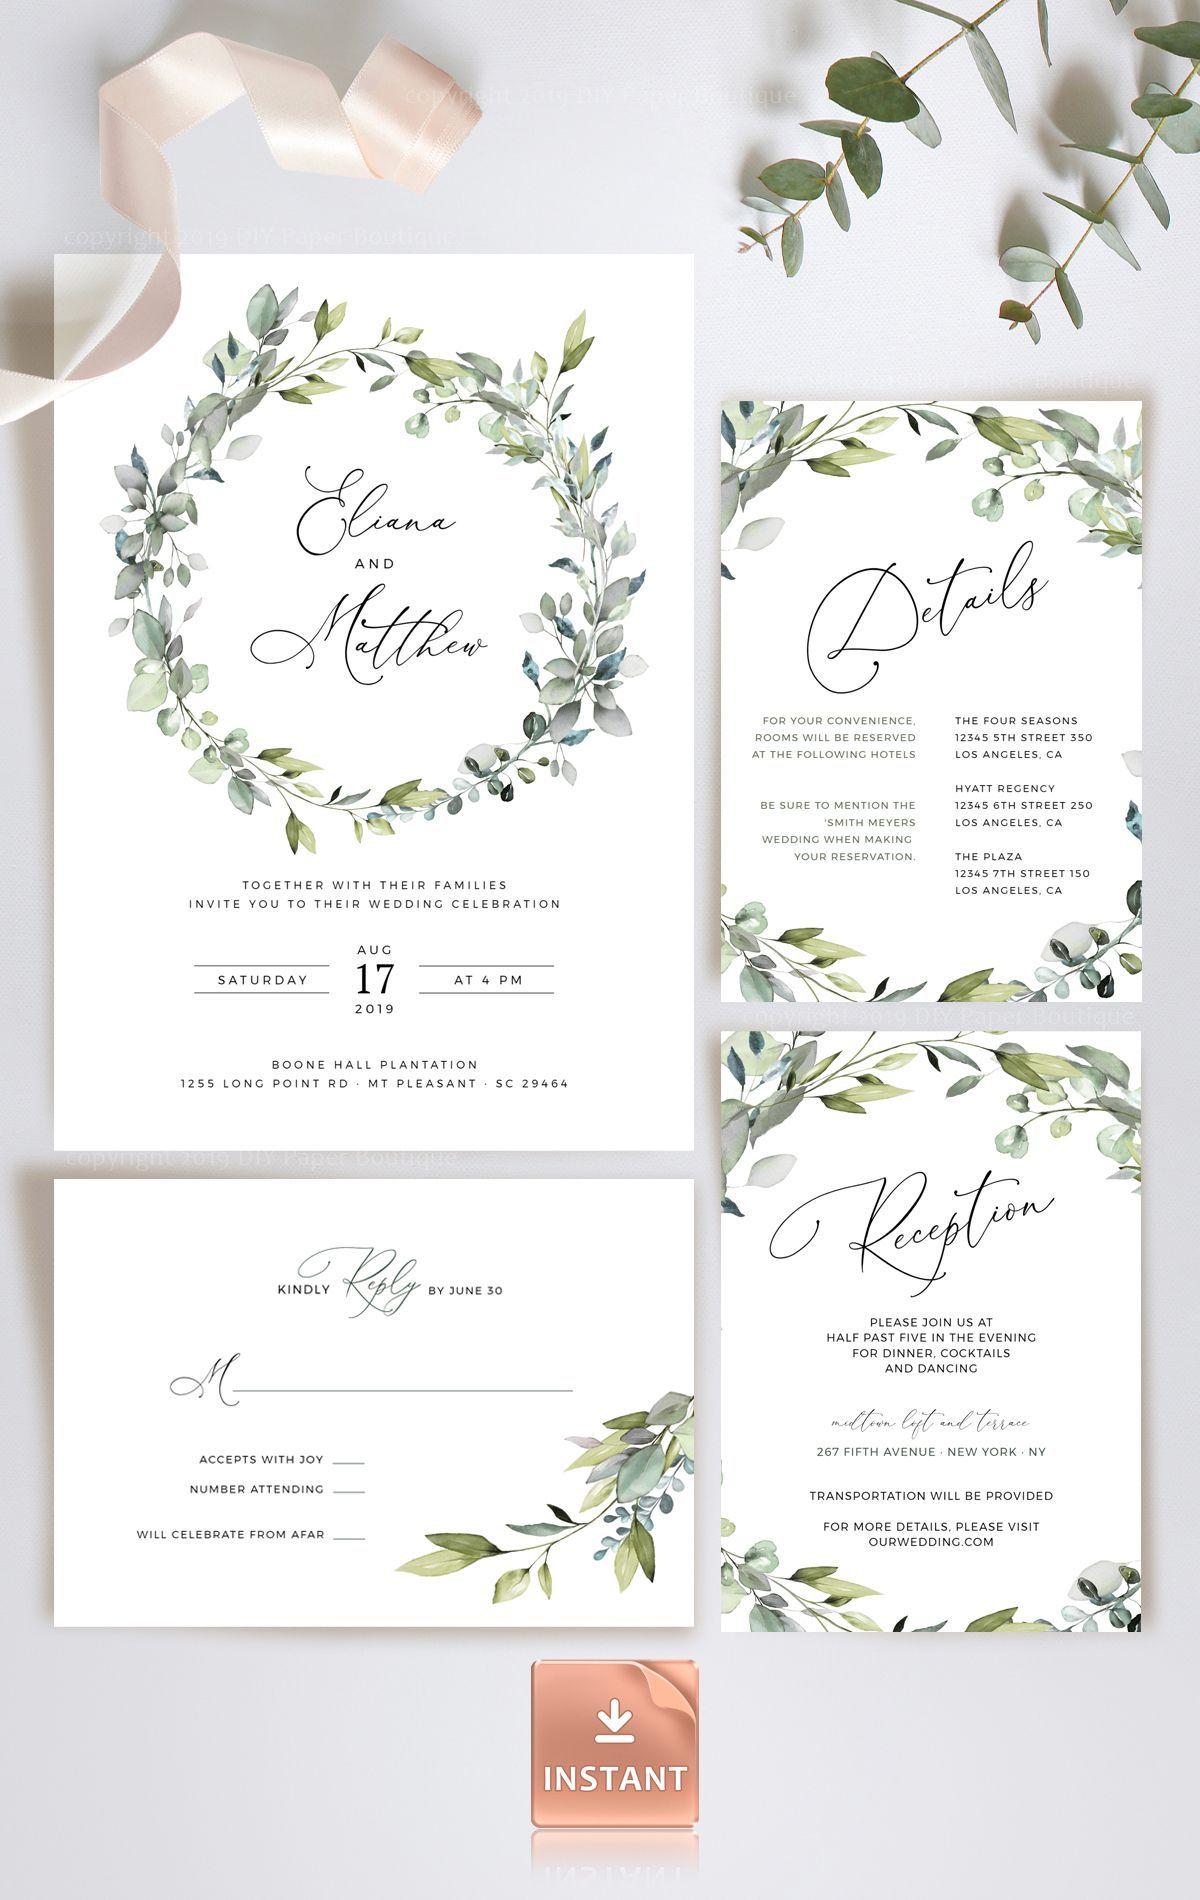 Boho Greenery Wedding Invitation Template, Invitation To The in